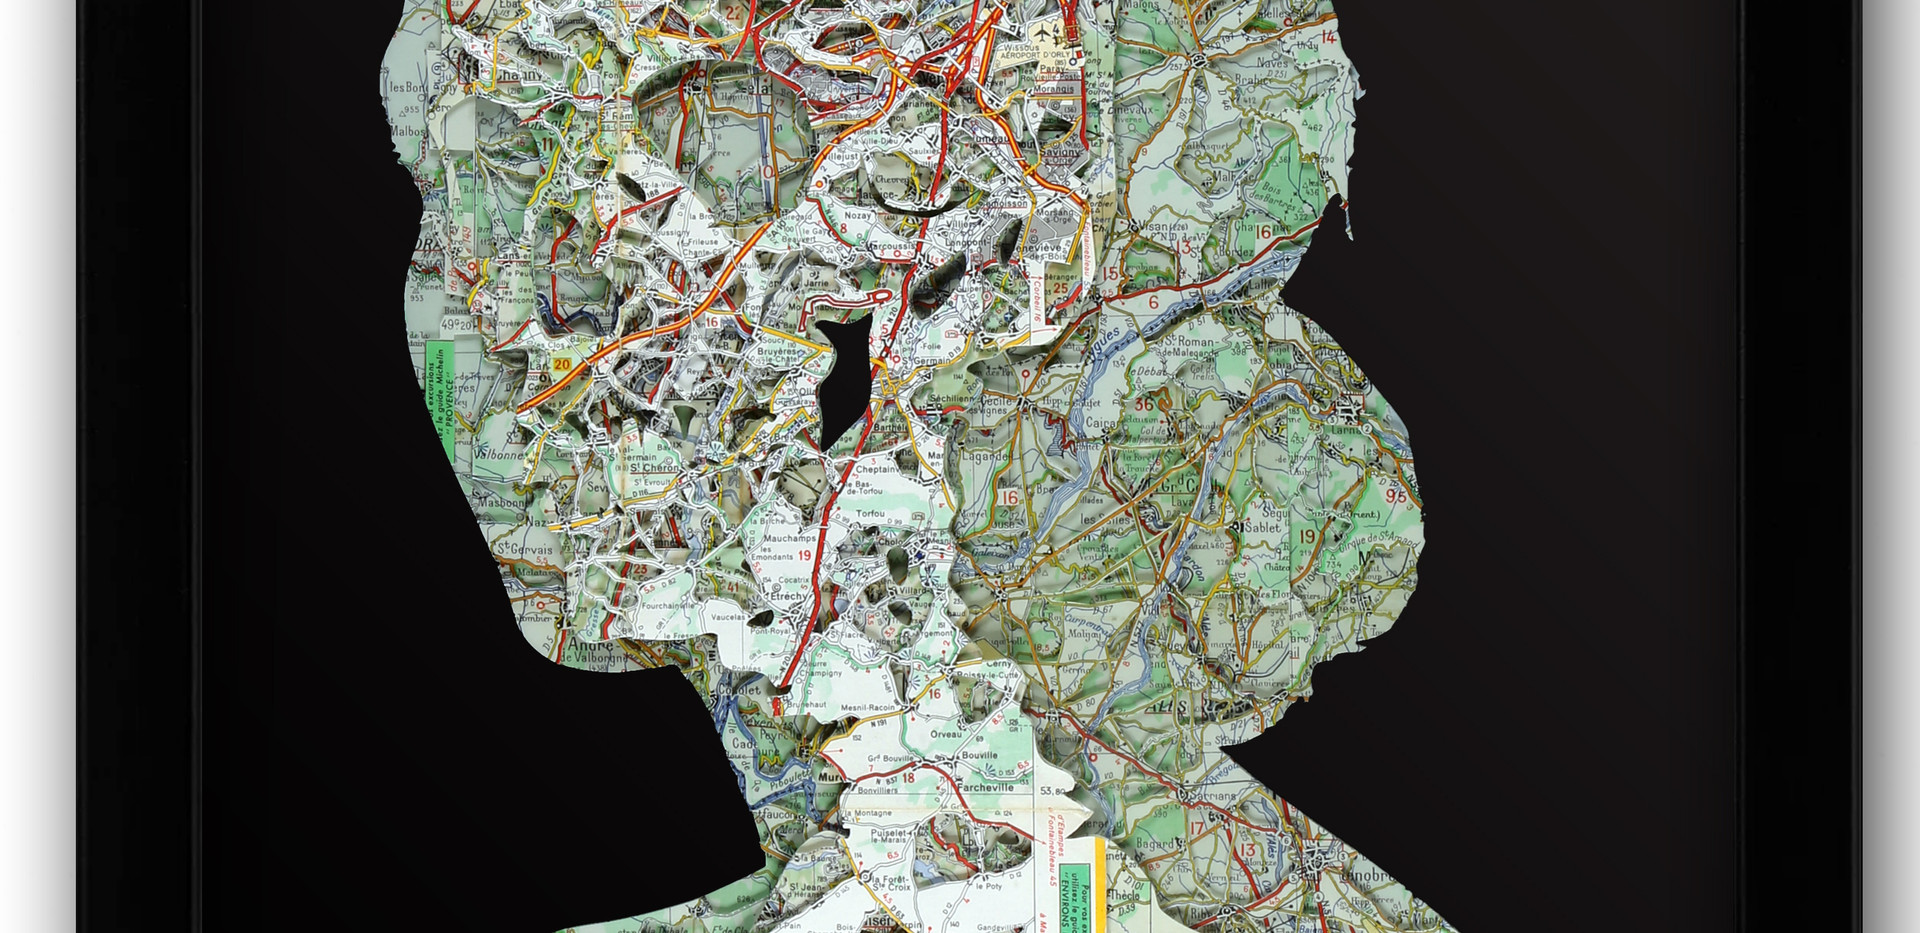 16x20 Woman & Skull.jpg